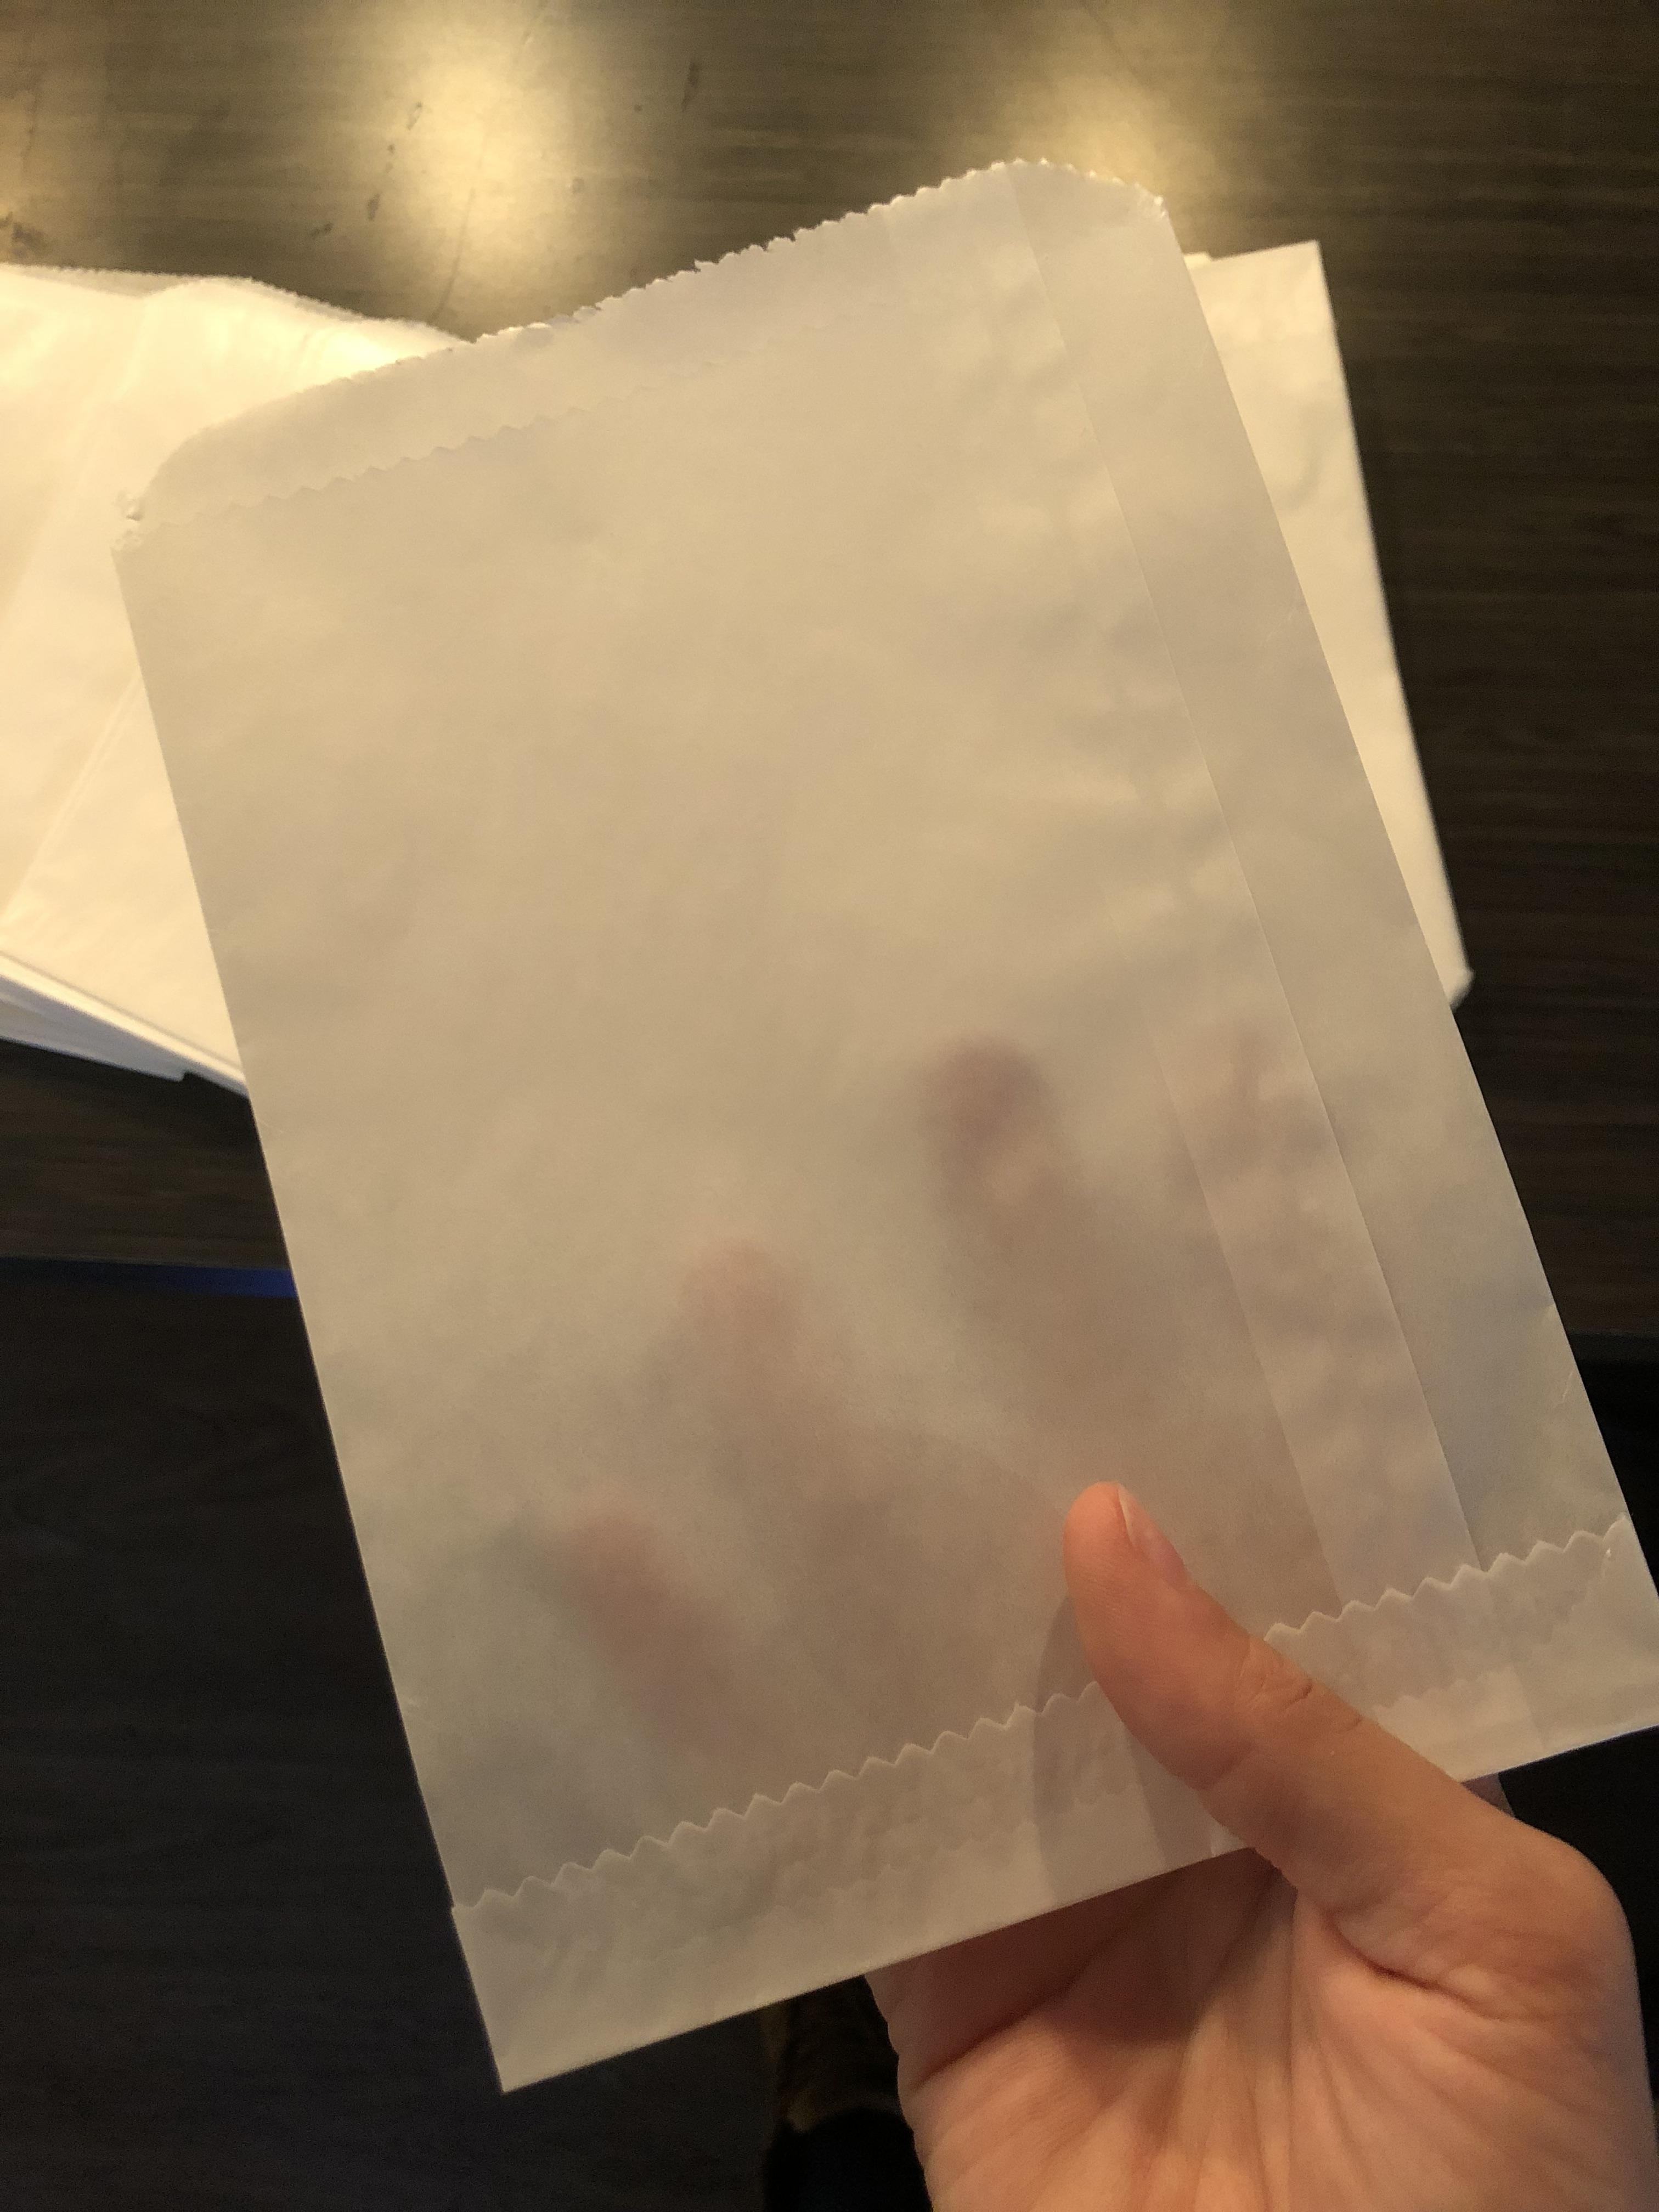 100 Pack Glassine Envelopes for 8x10 End Opening